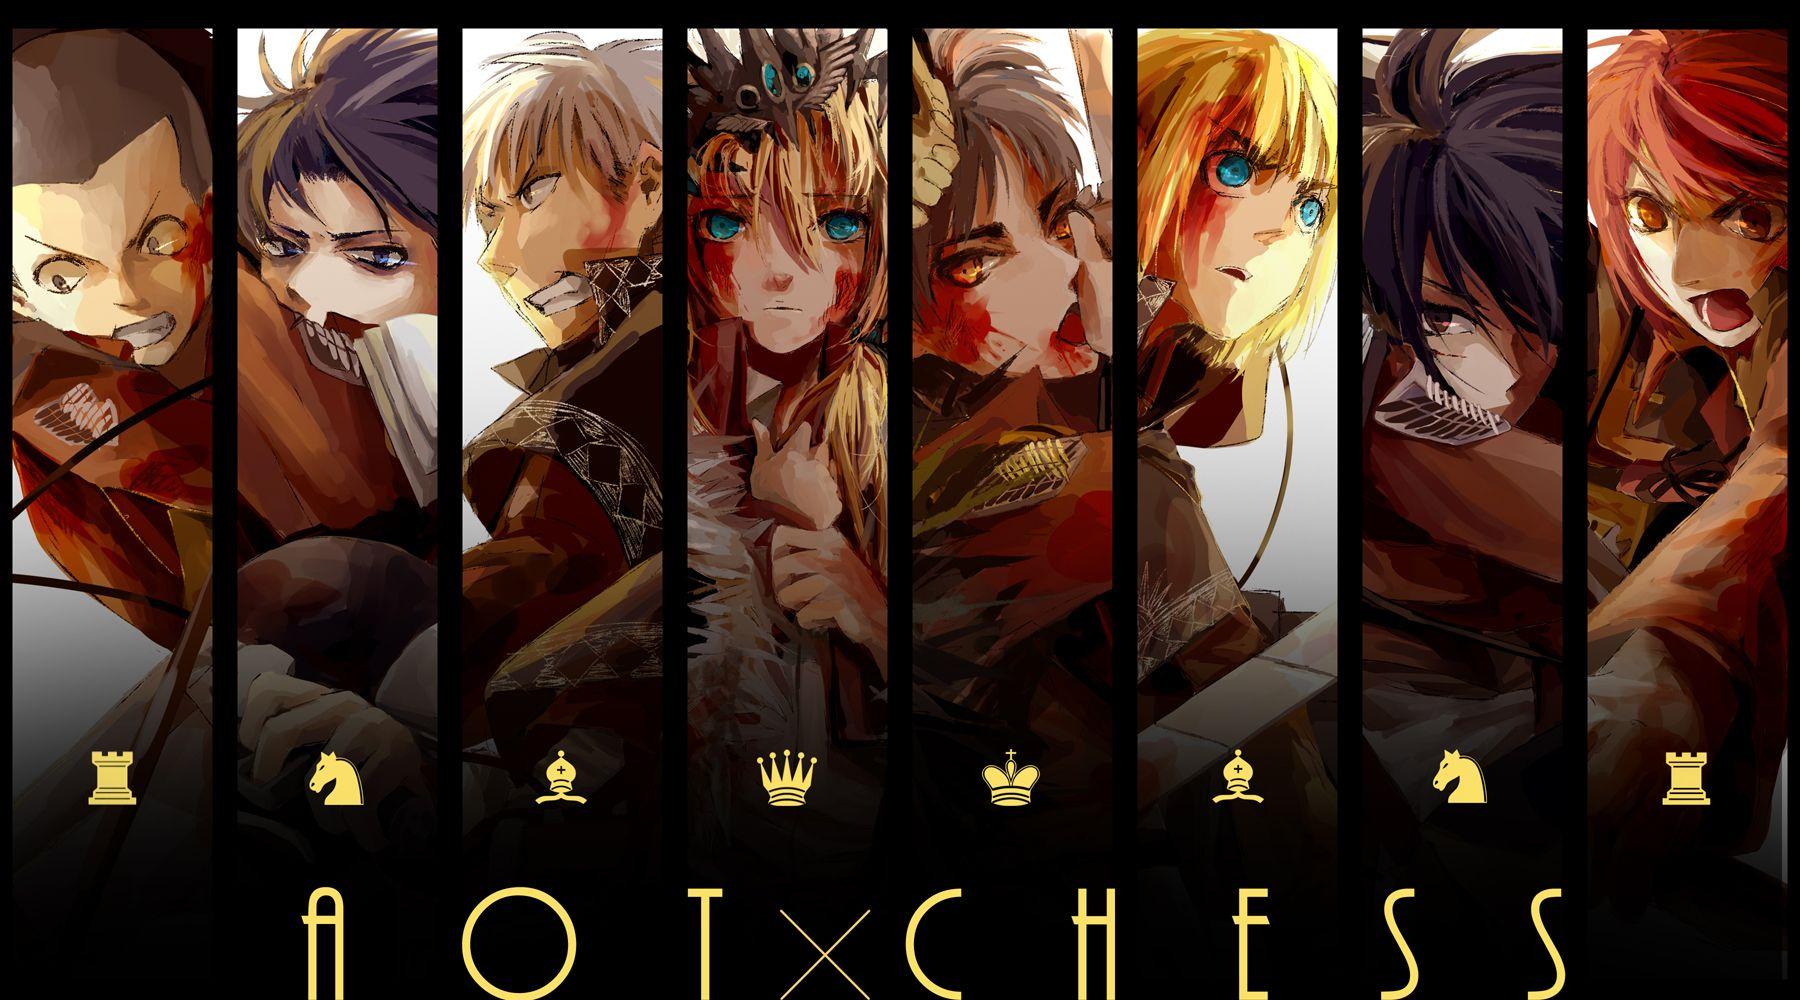 Attack on Titan - Conny, Rivaille, Jean, Christa, Erin, Armin, Mikasa, and Sasha